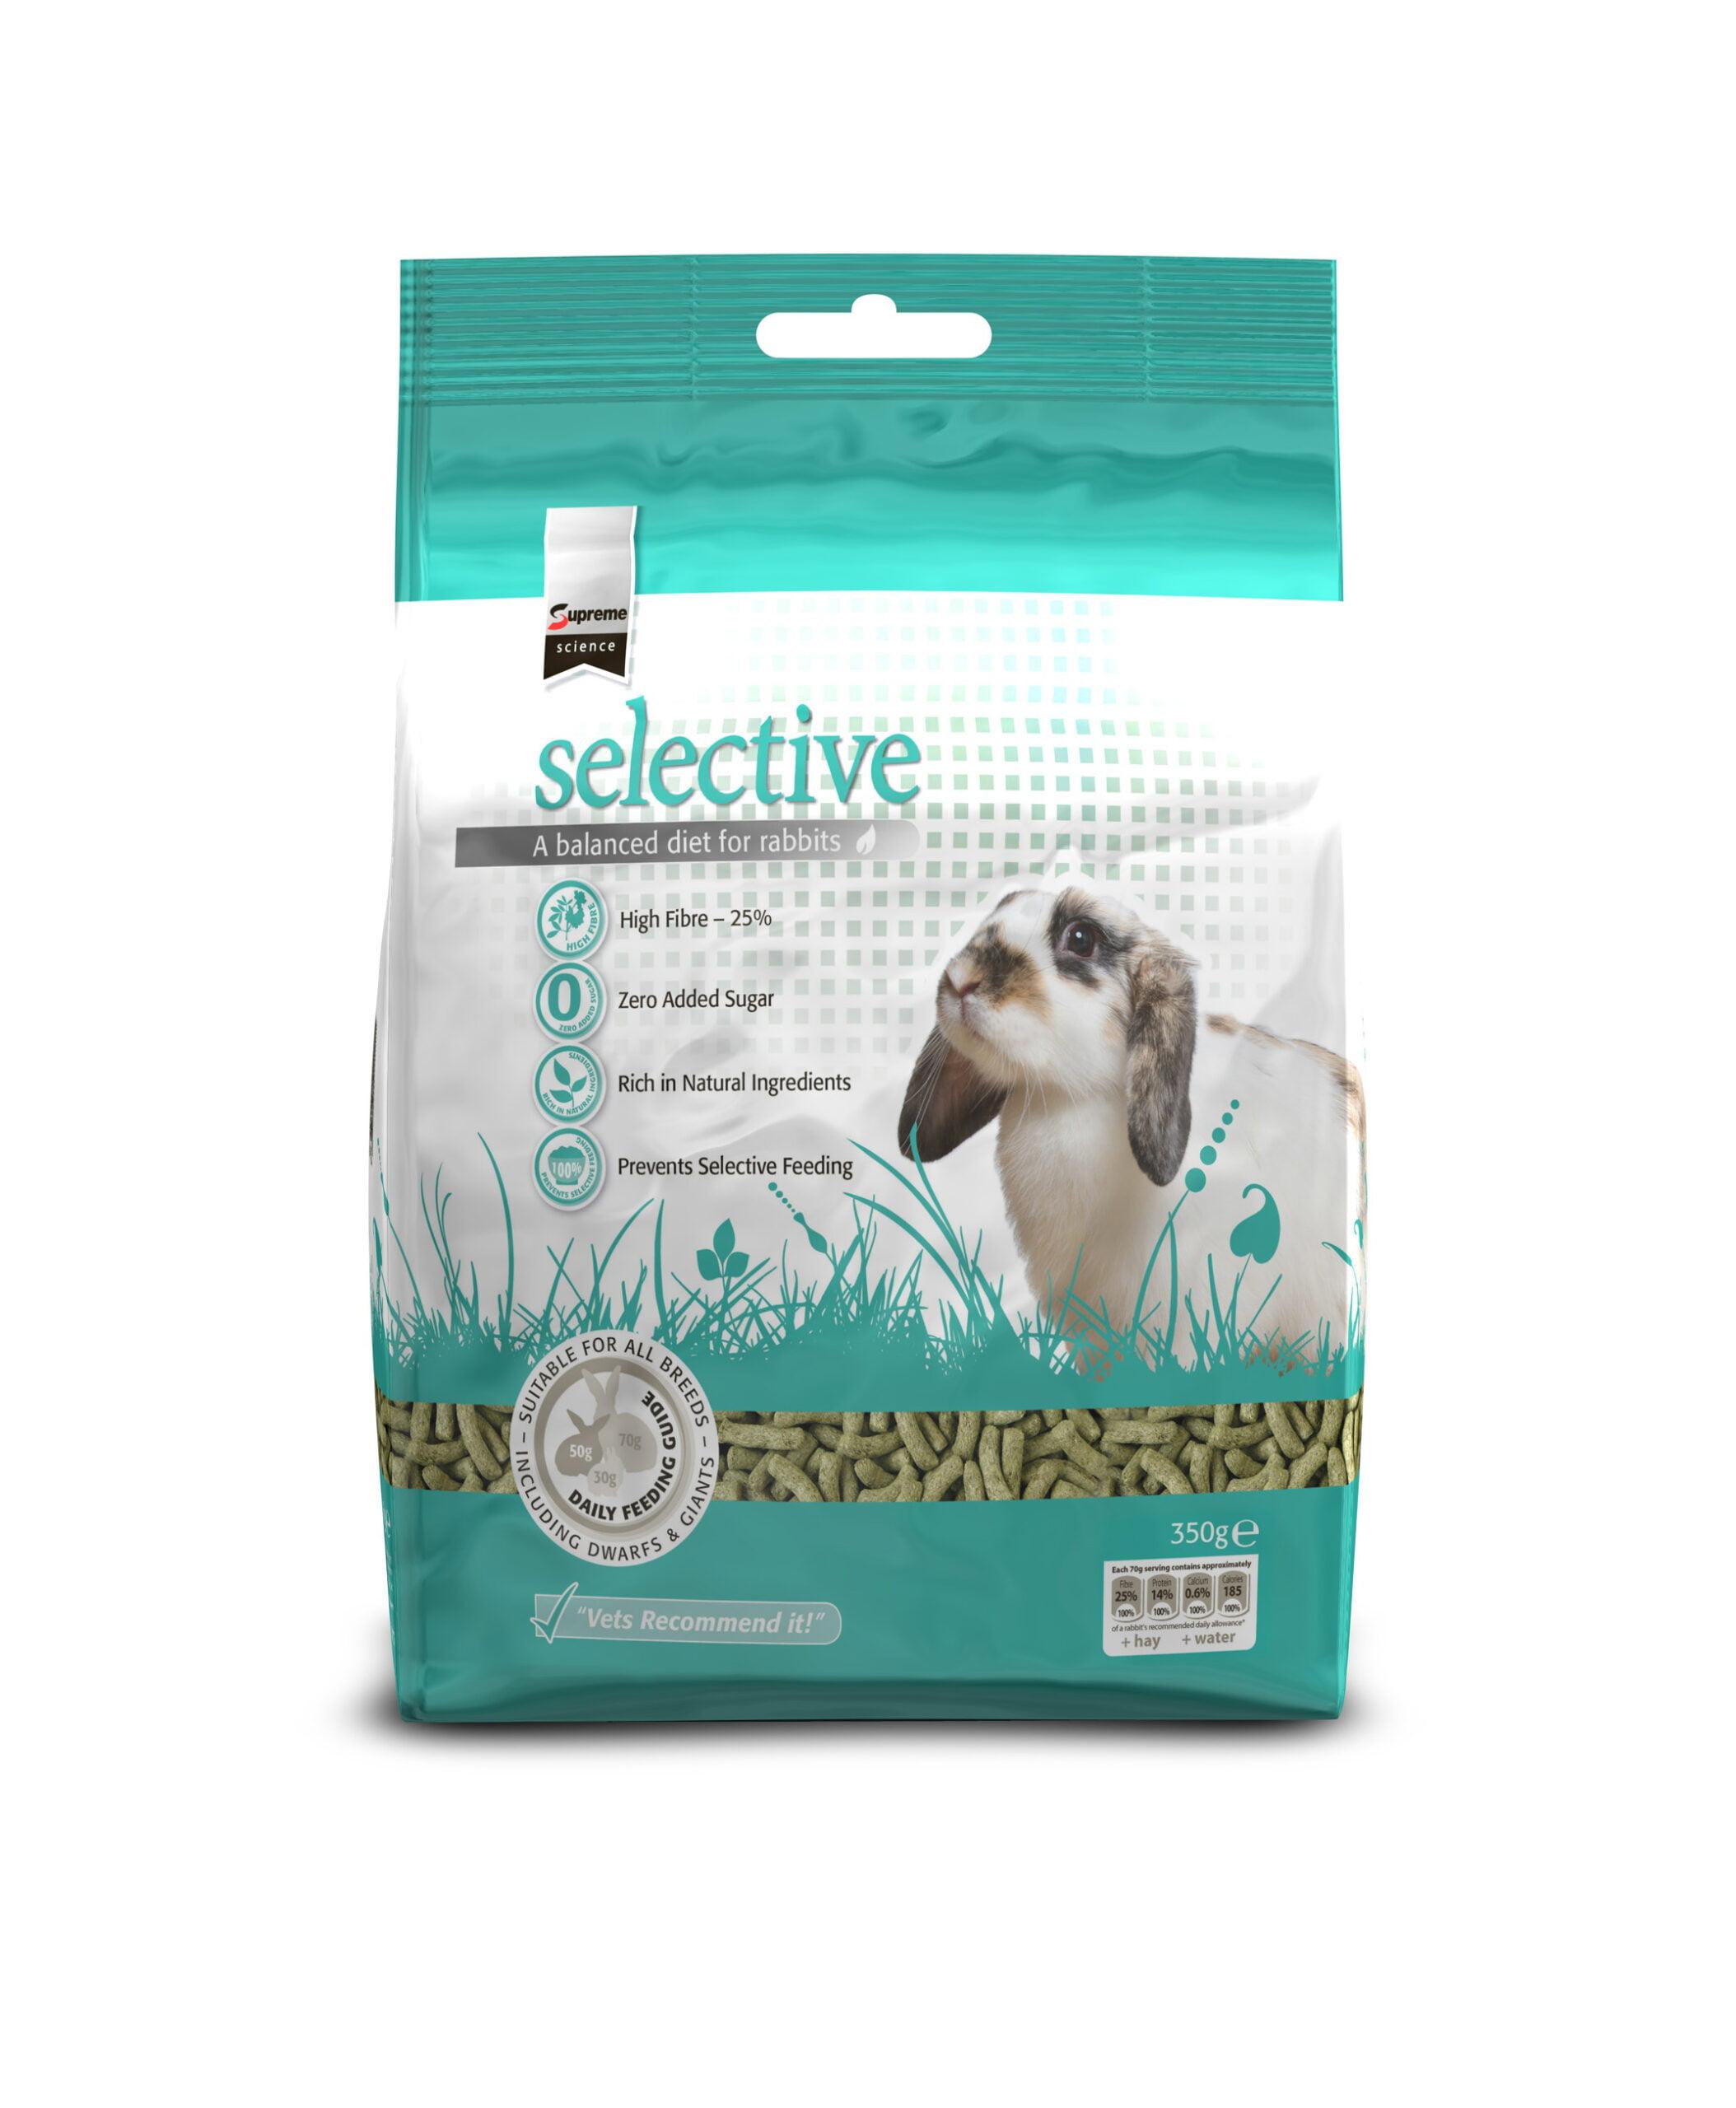 Supreme Selective Rabbit 5kg